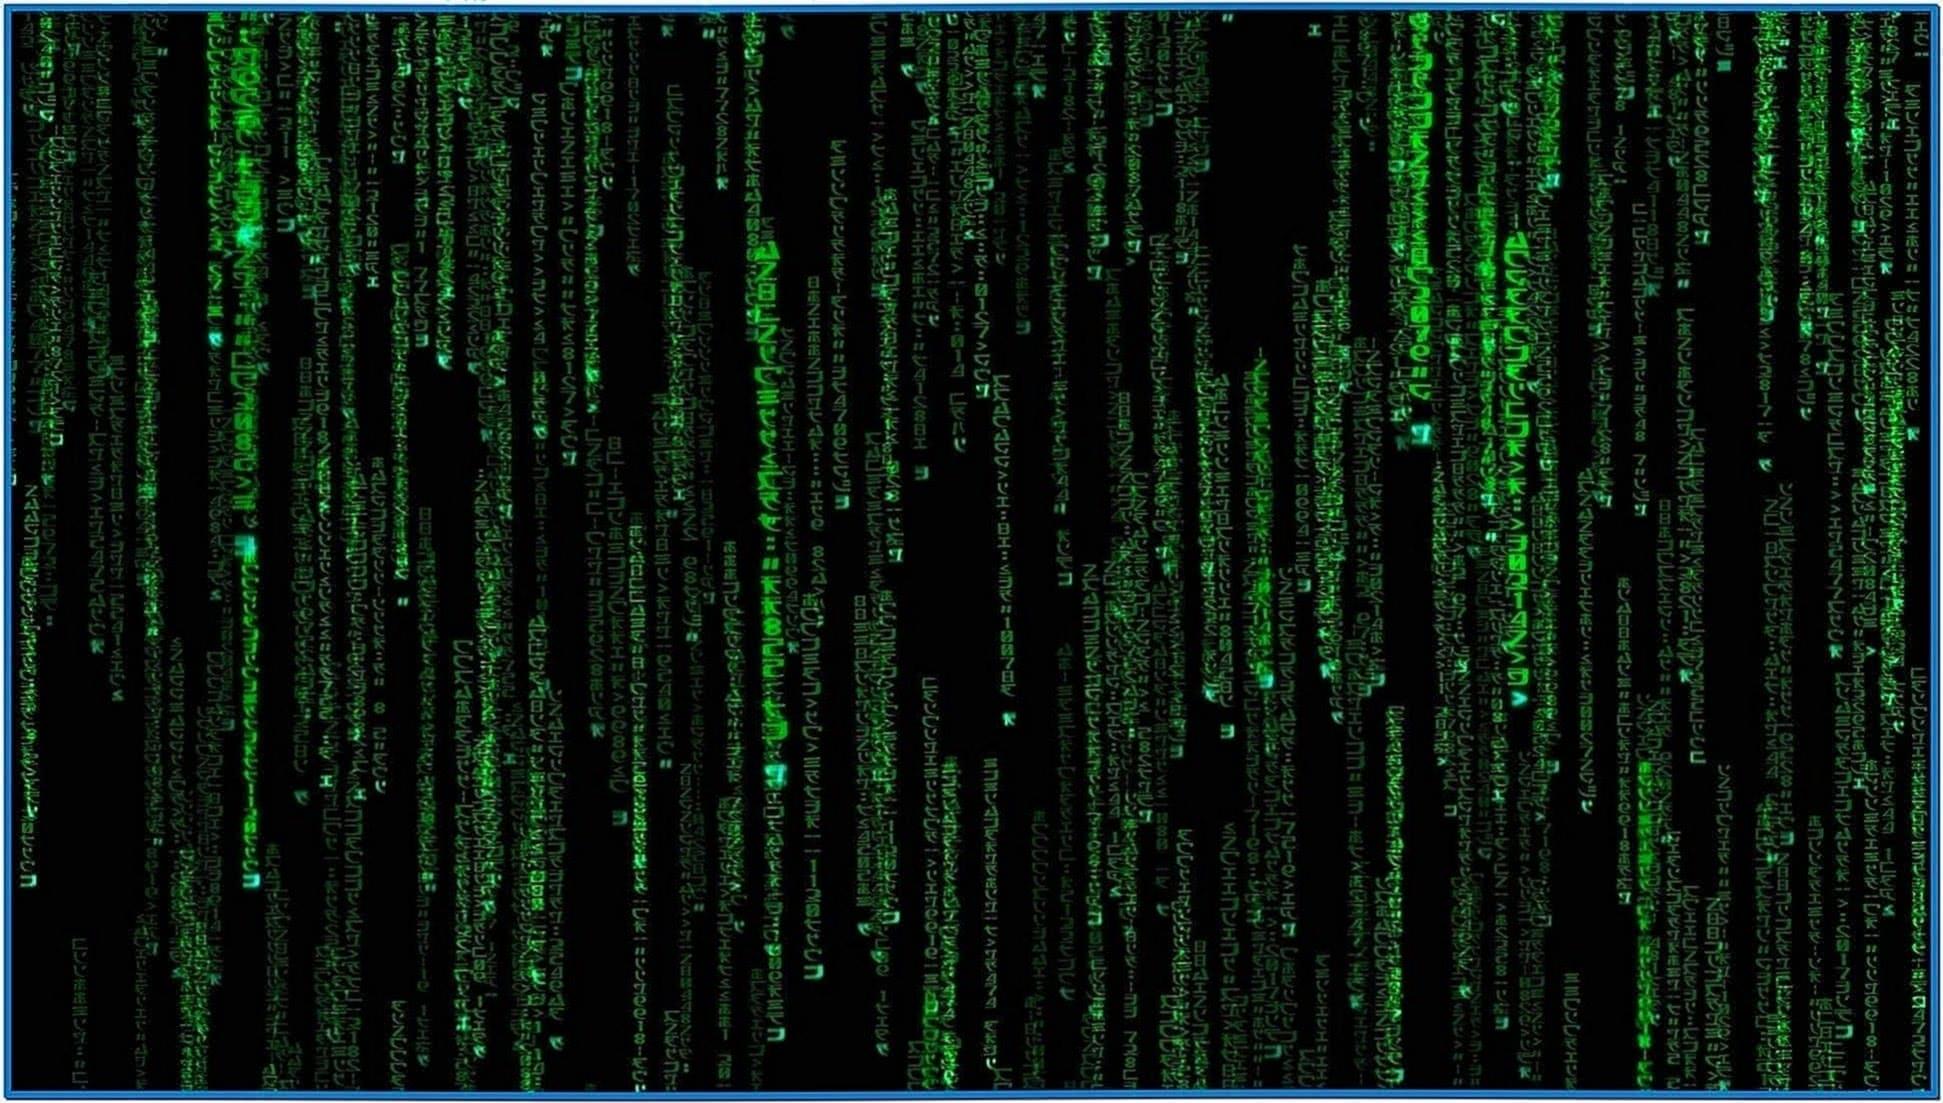 The Matrix Code Animated Screensaver